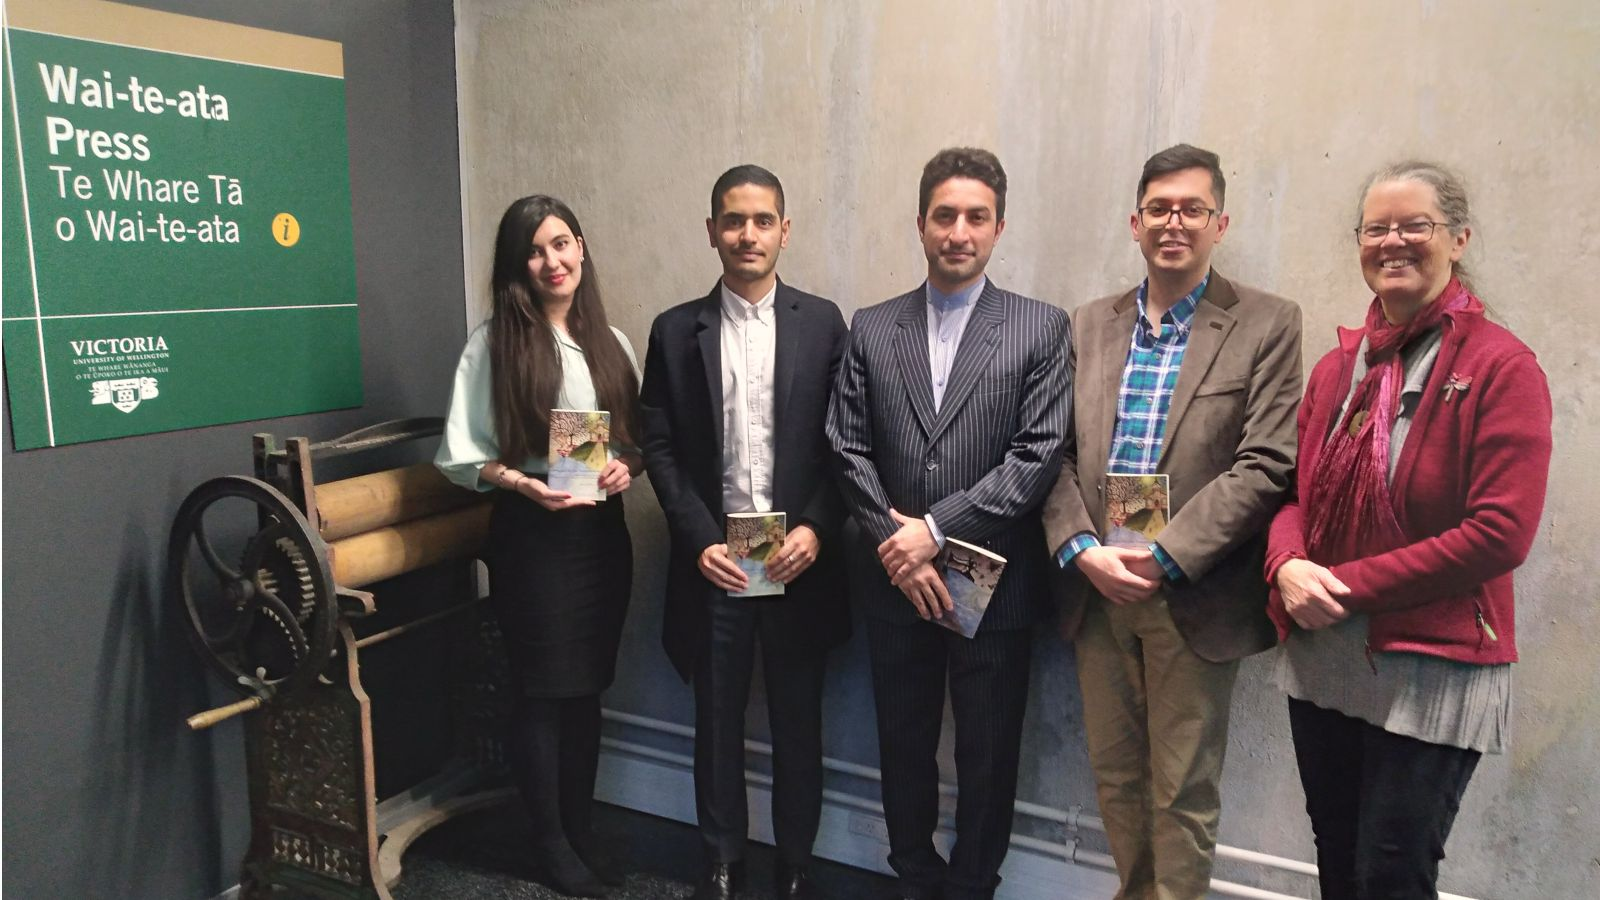 Translators Nastaran Arjomandi, Mohsen Kafi, and Fahim Afarinsadi with Mr Shamsollah Azimi and Associate Professor Sydney Shep outside Wai-te-ata Press.